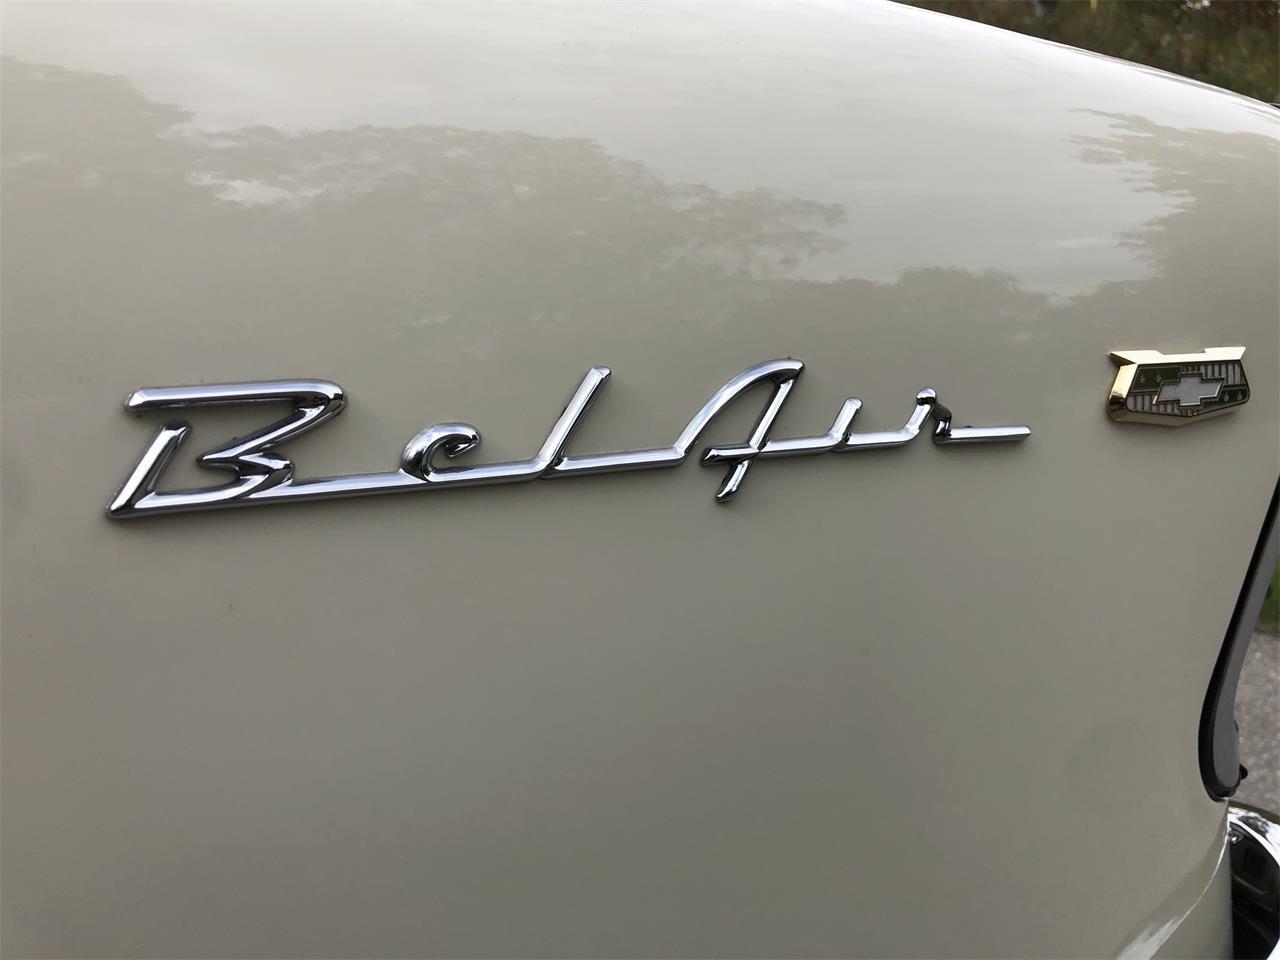 1956 Chevrolet Bel Air Nomad (CC-1308708) for sale in Waterloo, Ontario